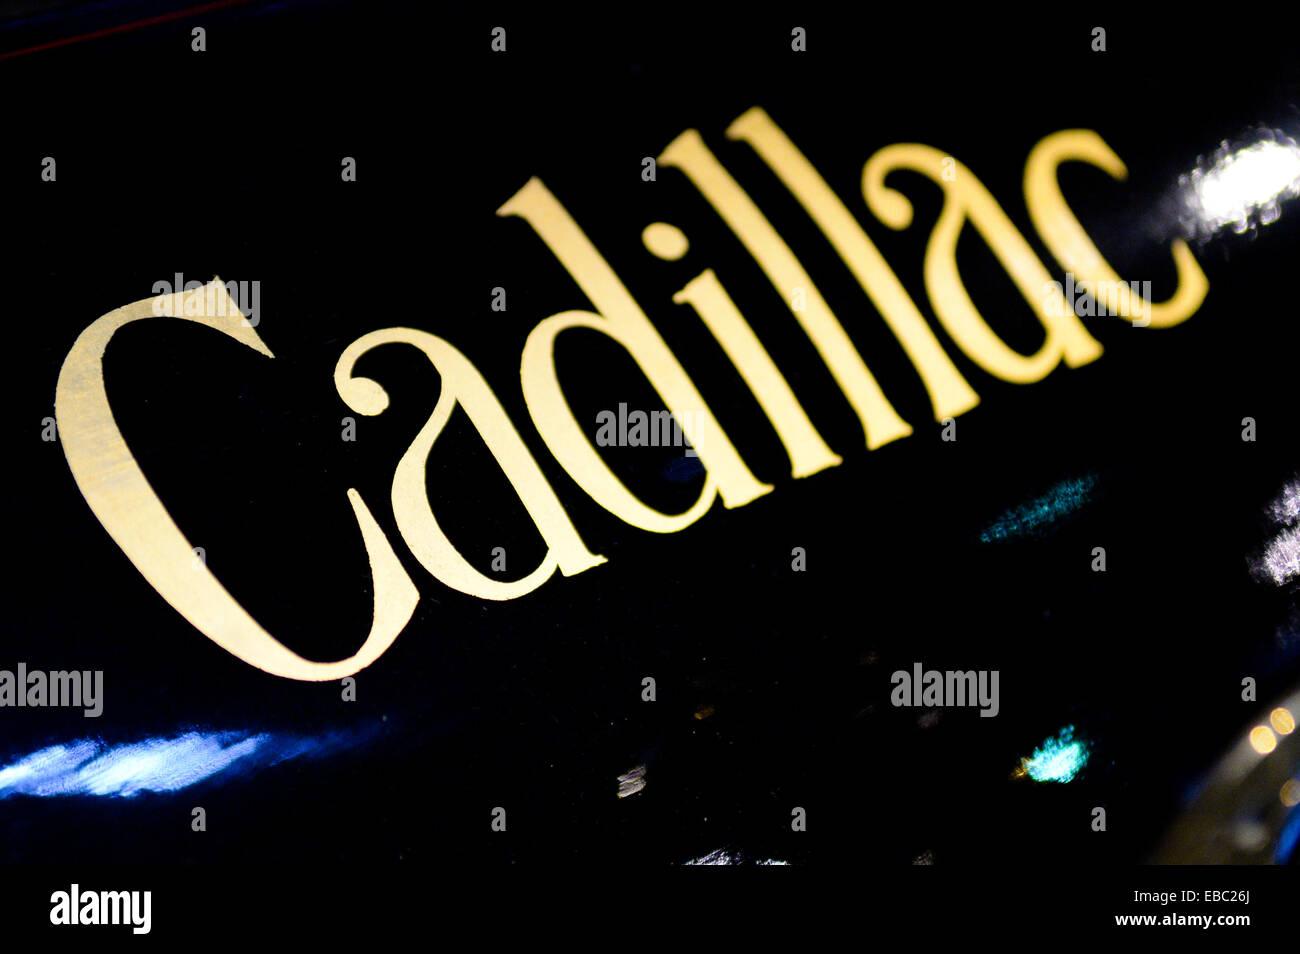 Old Cadillac Logo Stock Photo Royalty Free Image 75867866